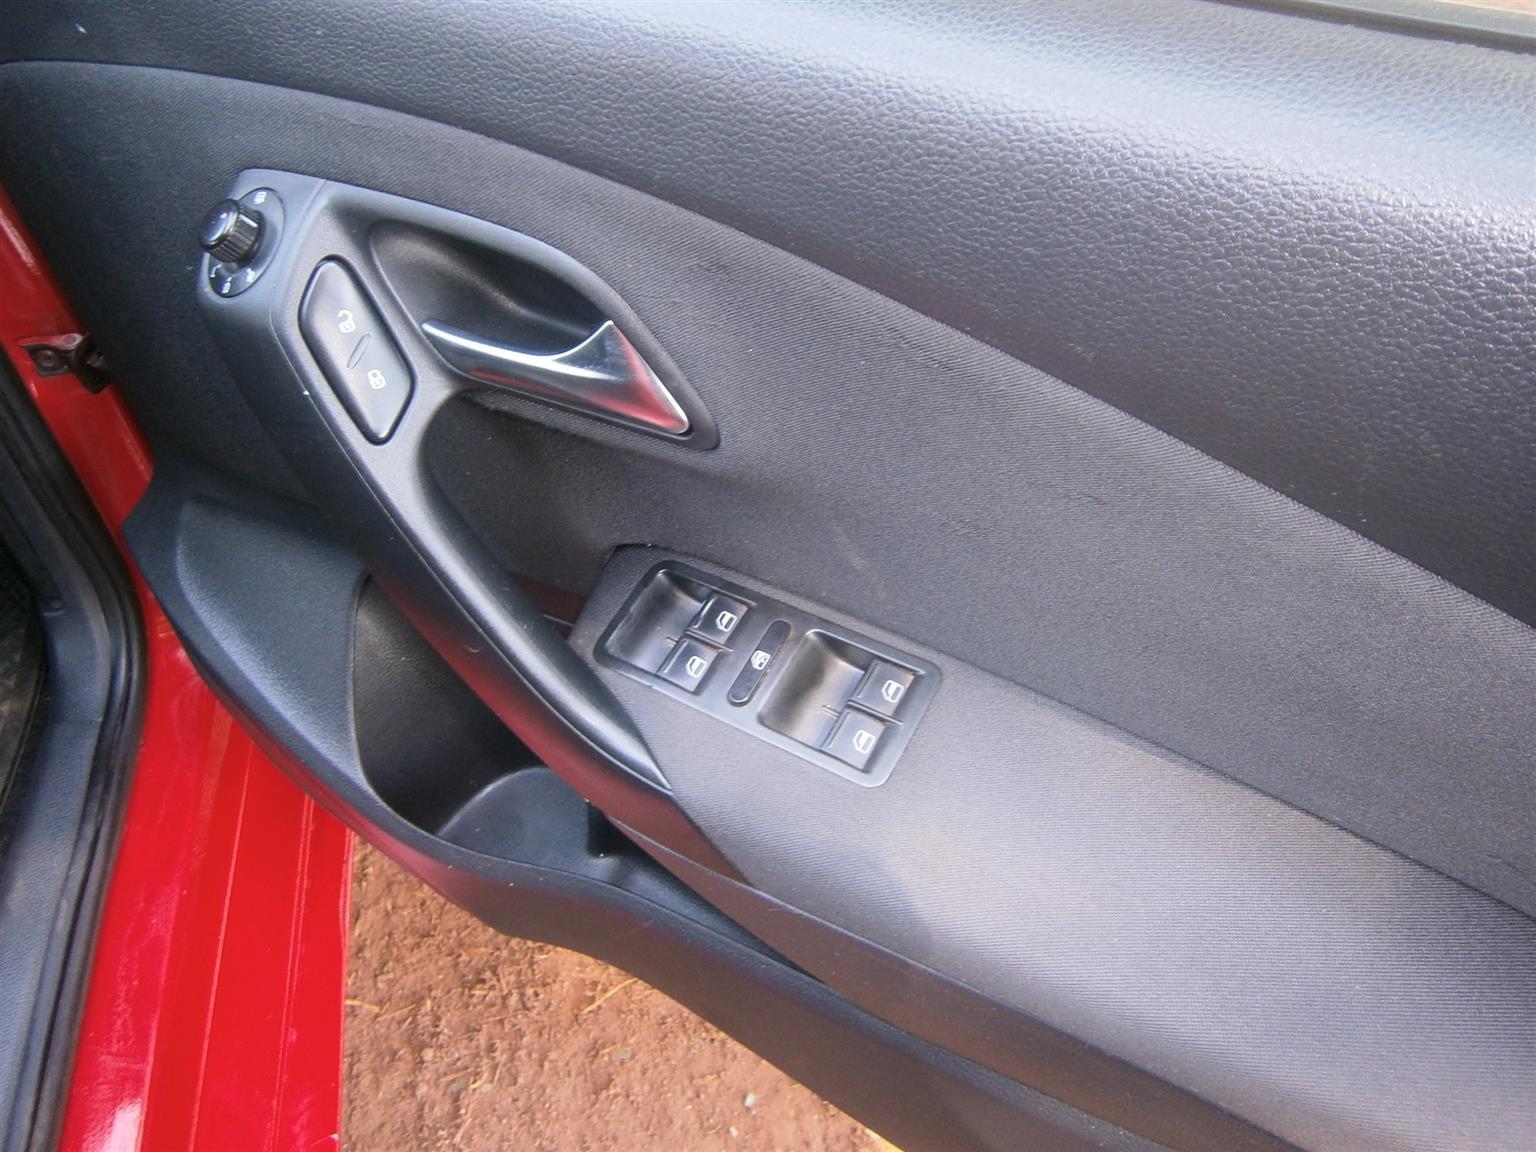 2017 Ford Focus hatch 3-door FOCUS 2.5 ST 3Dr